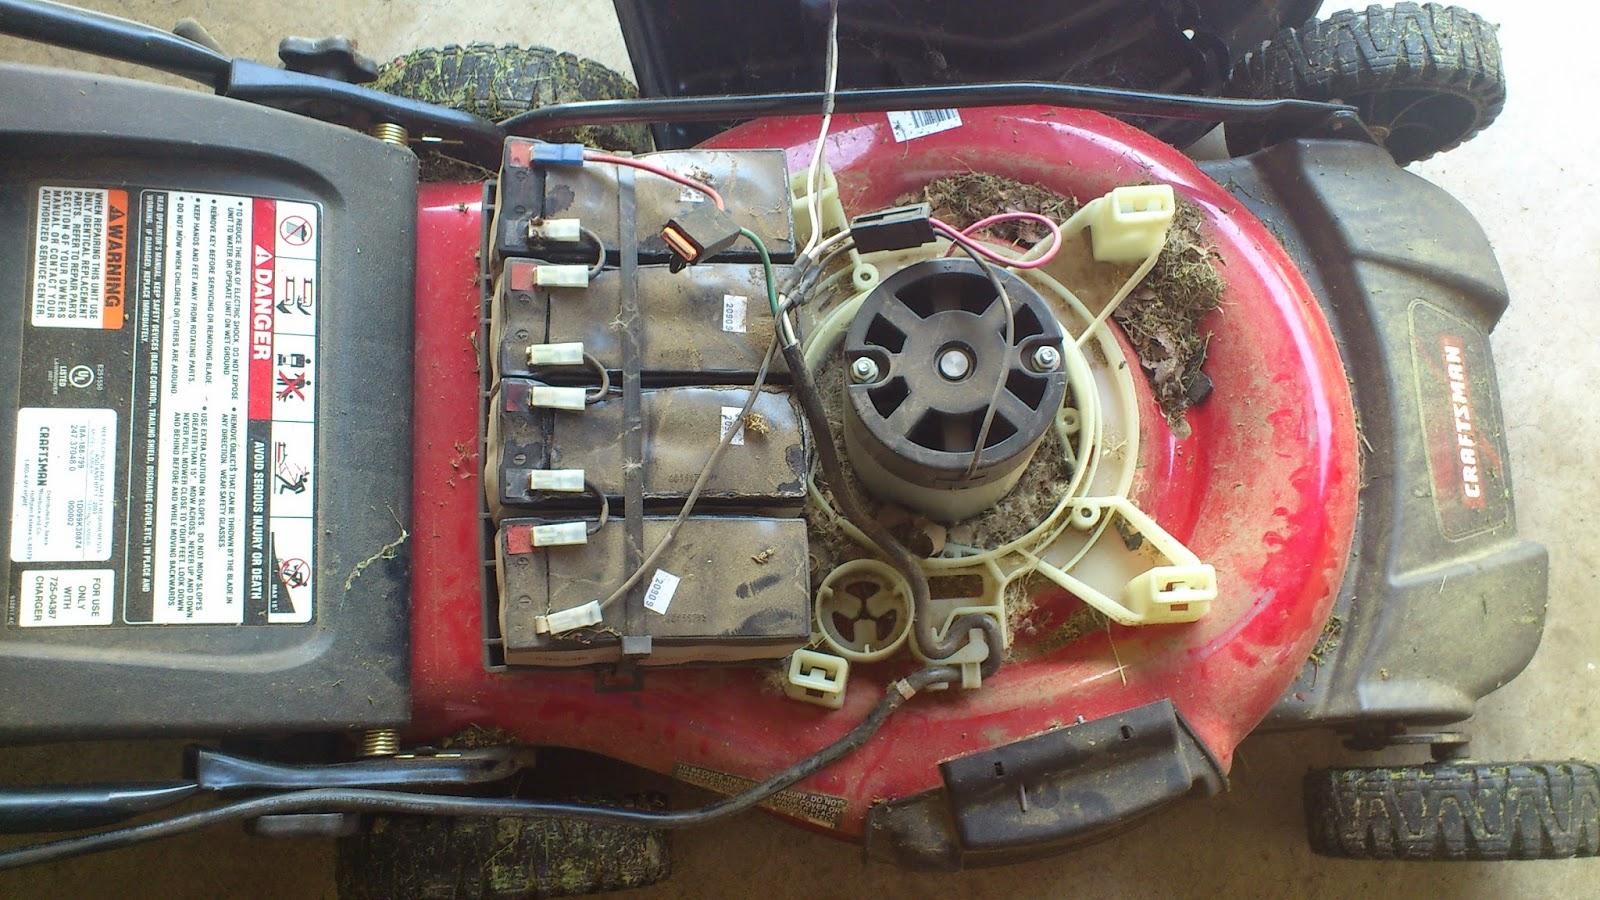 Hanix diy public repairing my craftman electric lawn mower for Lawn mower electric motor